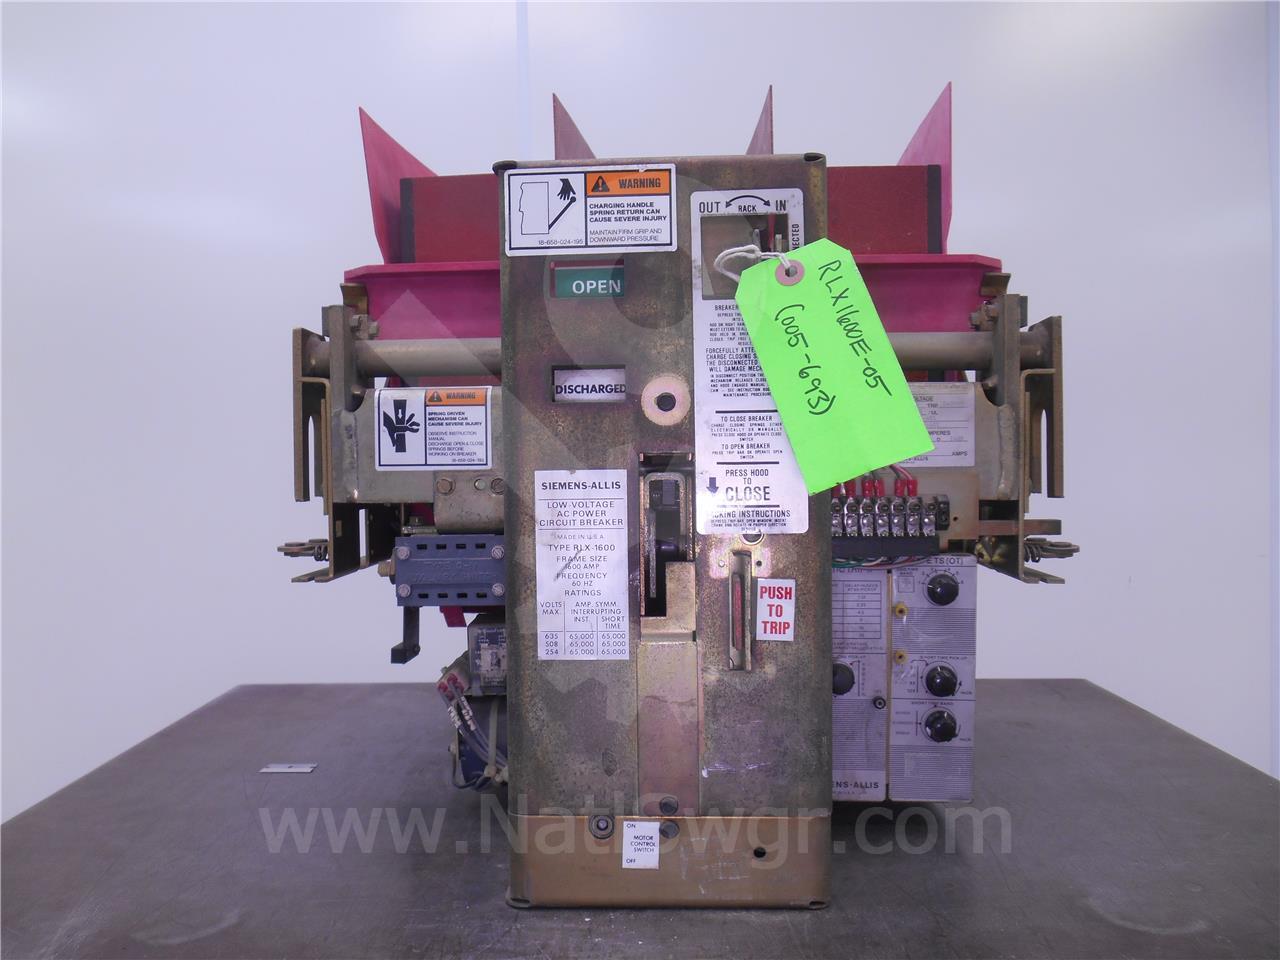 RLX-1600 1600A Siemens / Allis Chalmers EO/DO 240VAC CONTROL, STII TS OT, 1600A CT'S